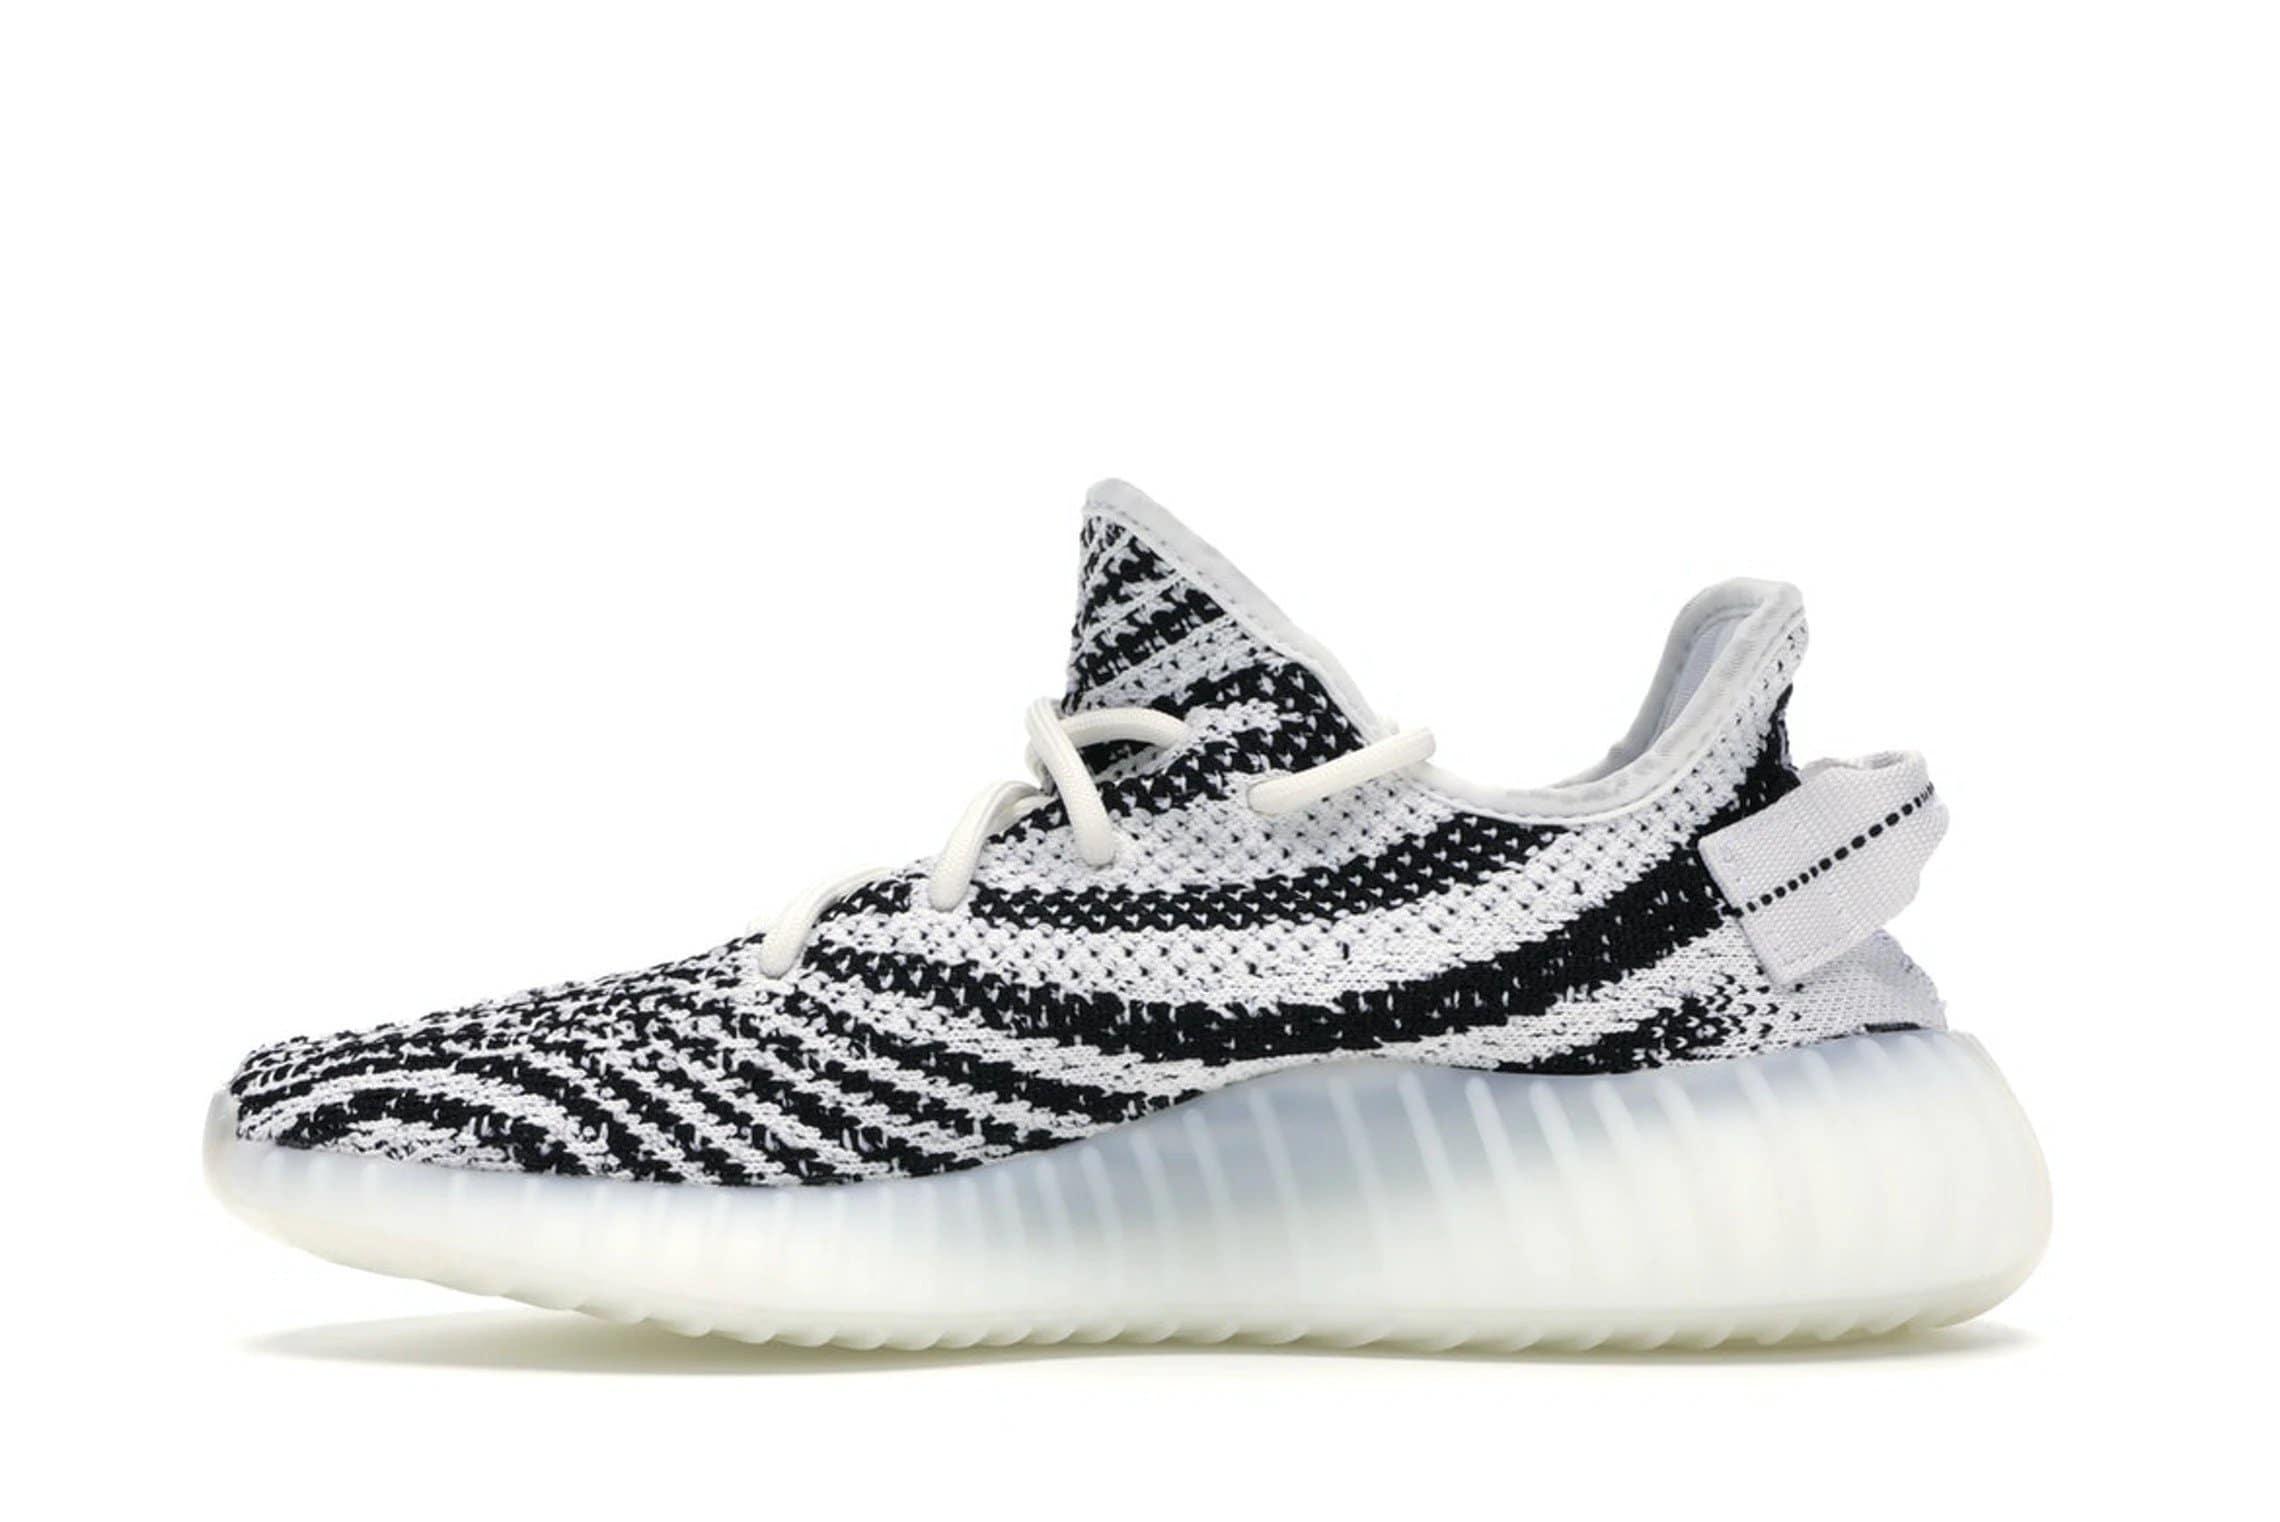 slide 3 - Yeezy 350 Zebra